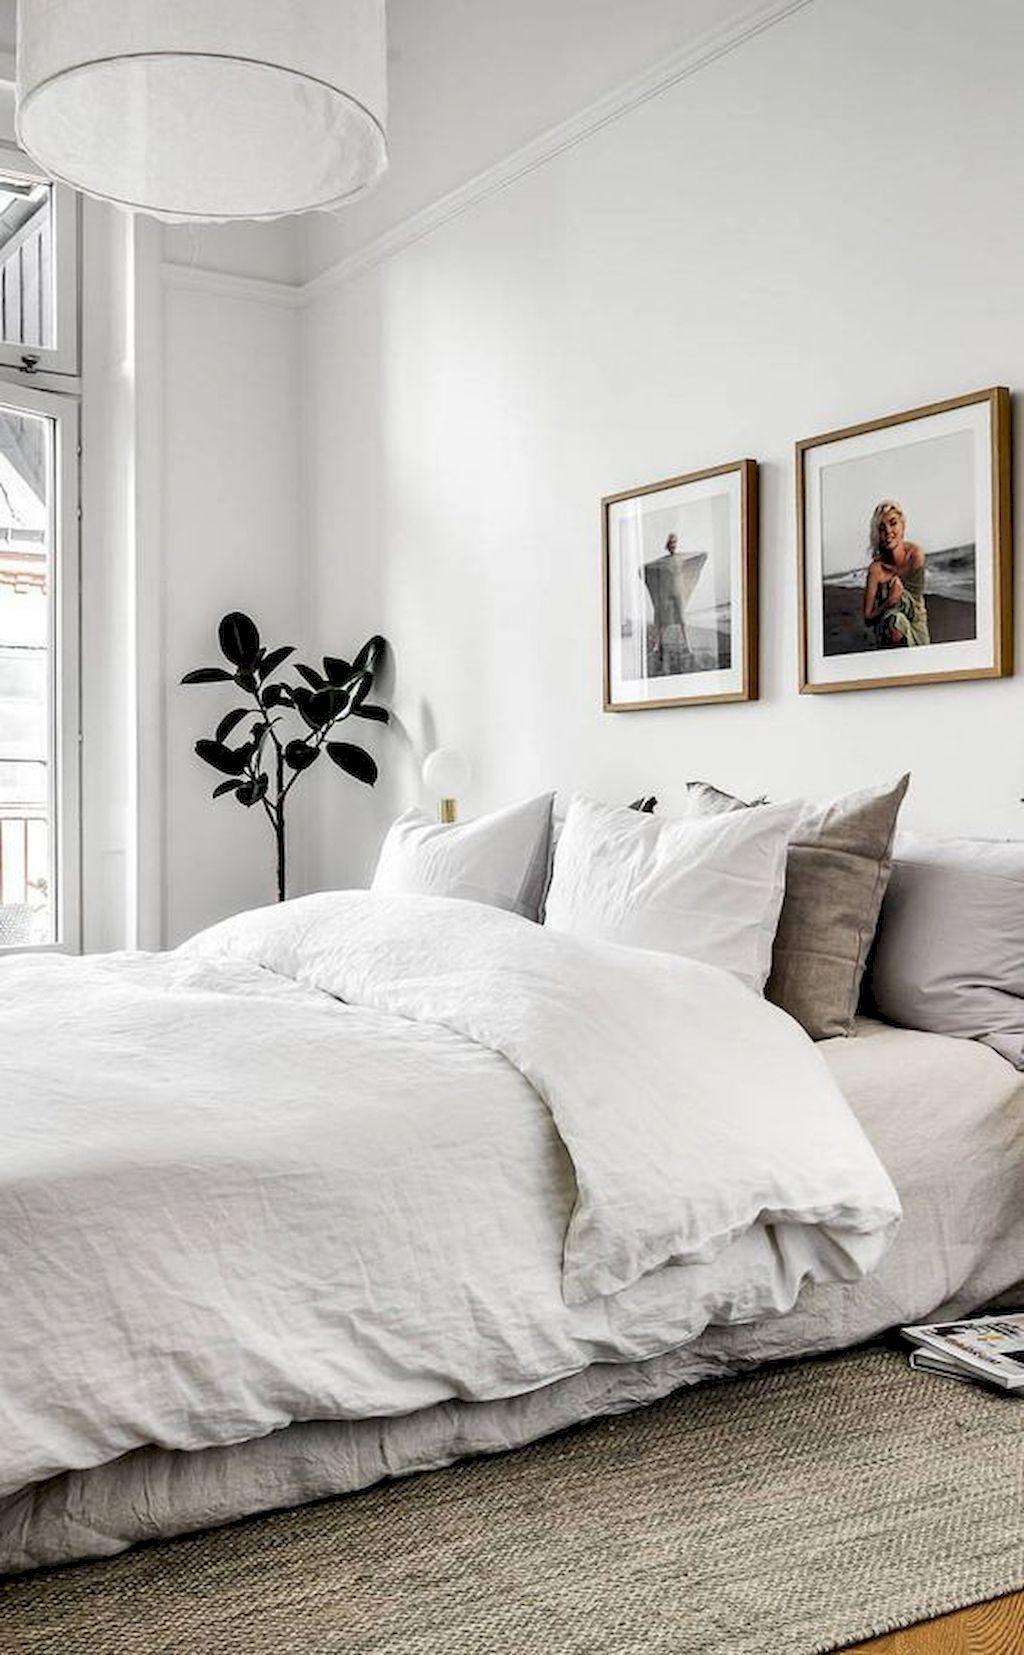 Adorable 90+ Inspired Scandinavian Master Bedroom Decoration https://carribeanpic.com/90-inspired-scandinavian-master-bedroom-decoration/